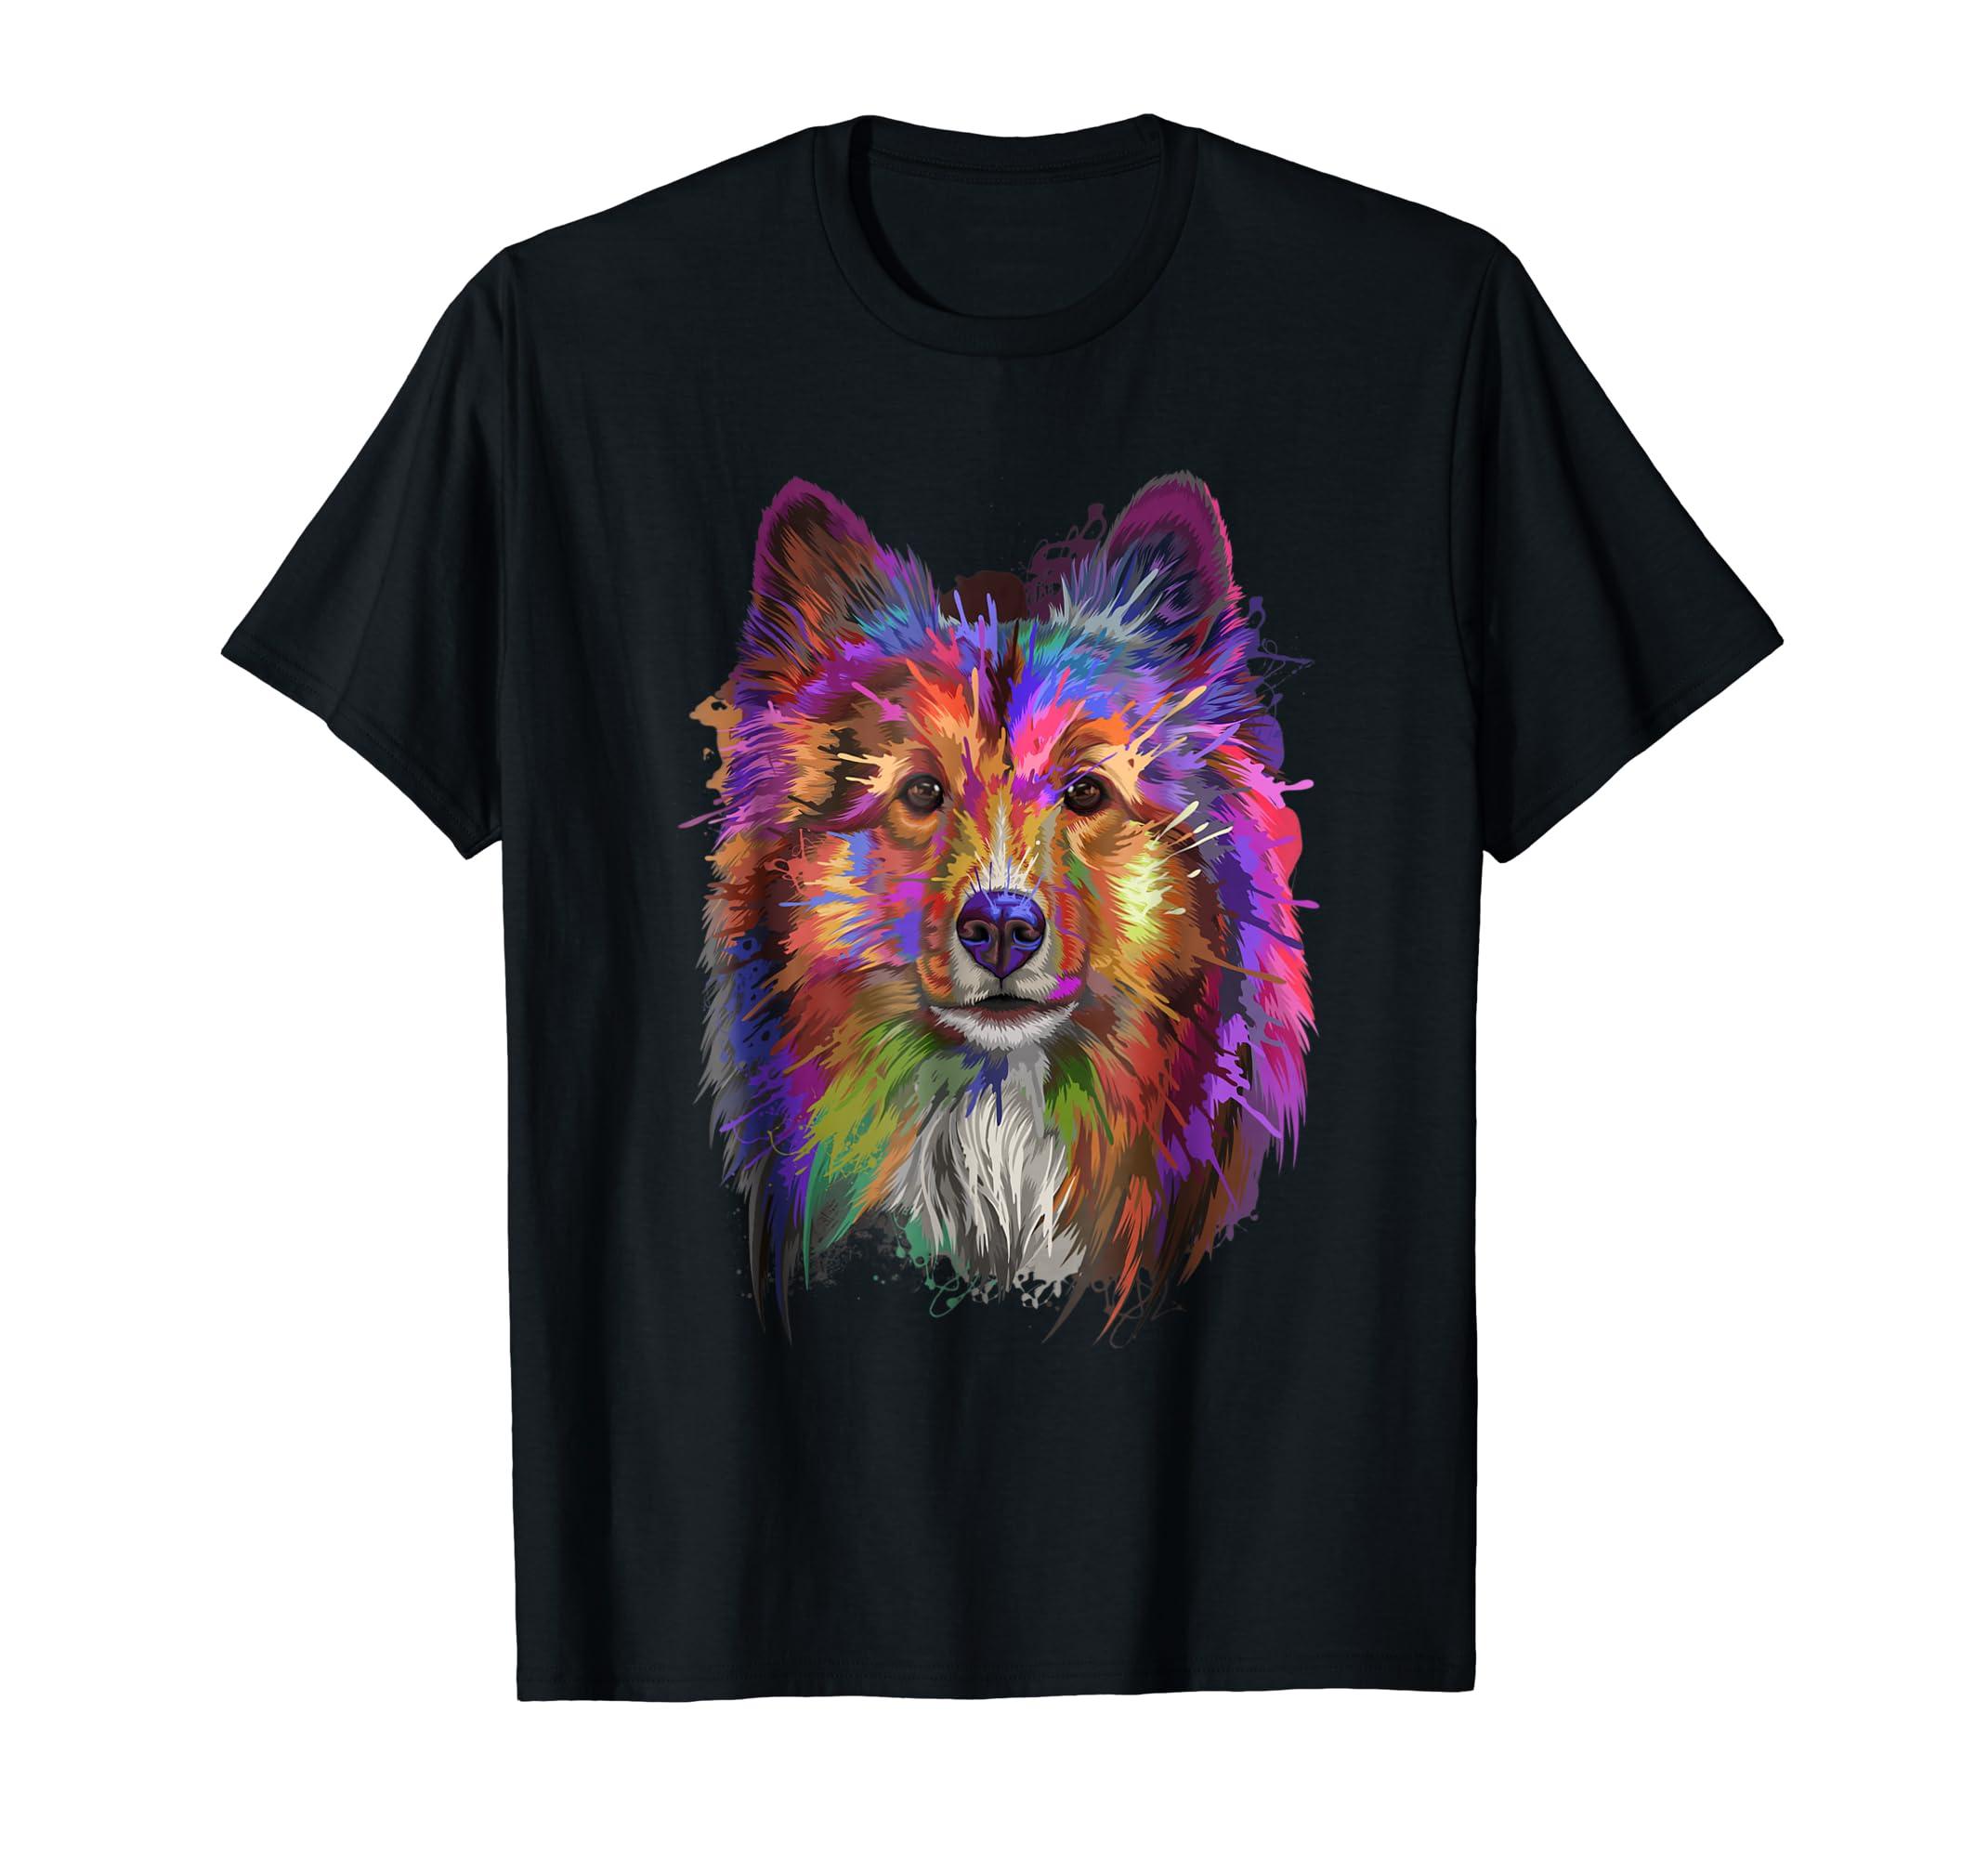 Splash Art Shetland Sheepdog T-Shirt | Cute Sheltie Gifts-Men's T-Shirt-Black